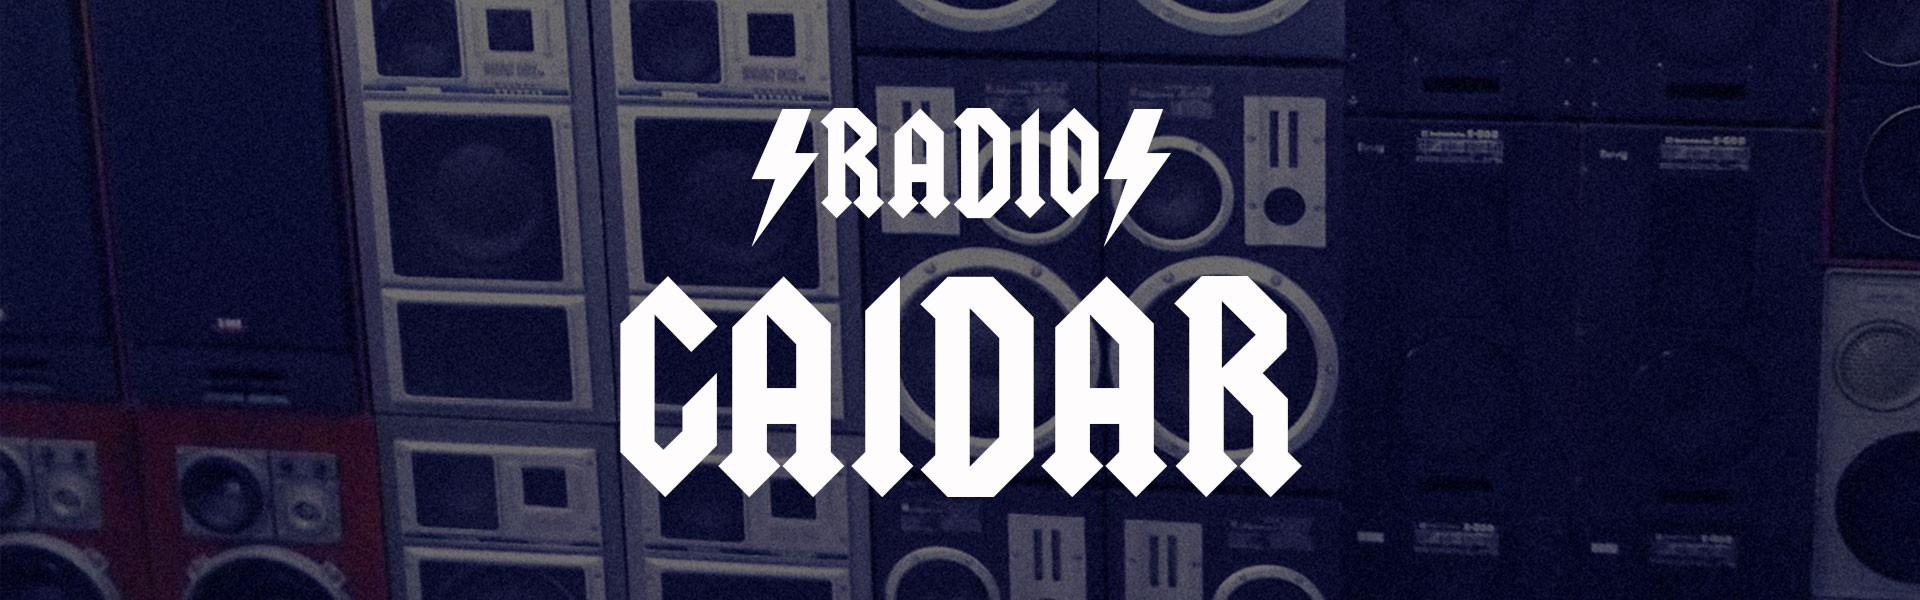 РОК ЖИВ. RADIO GAIDAR.